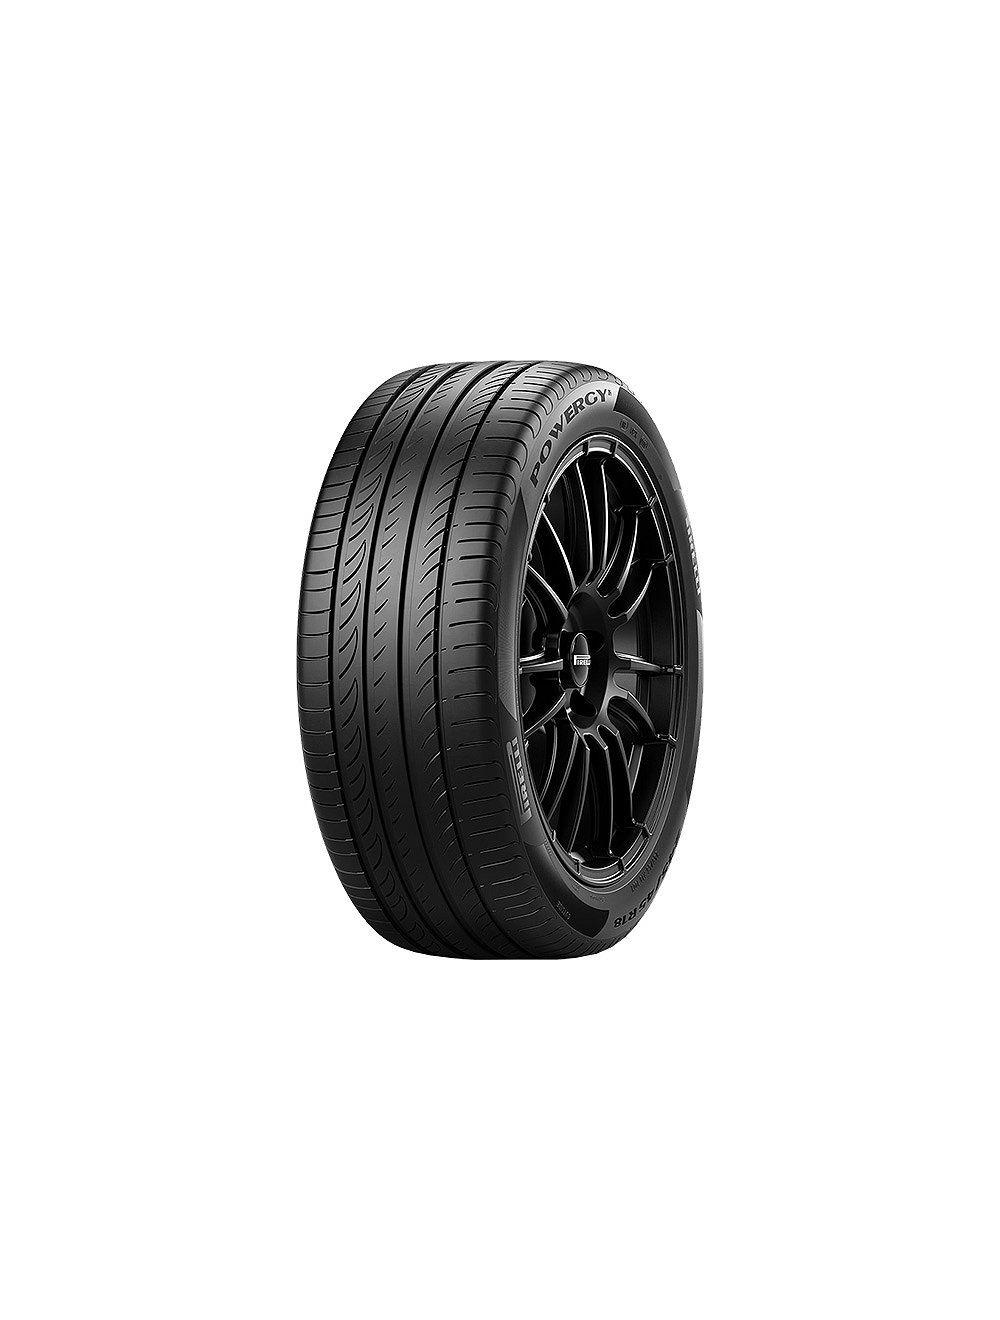 Pirelli 235/40R18 Y Powergy XL Nyári gumi